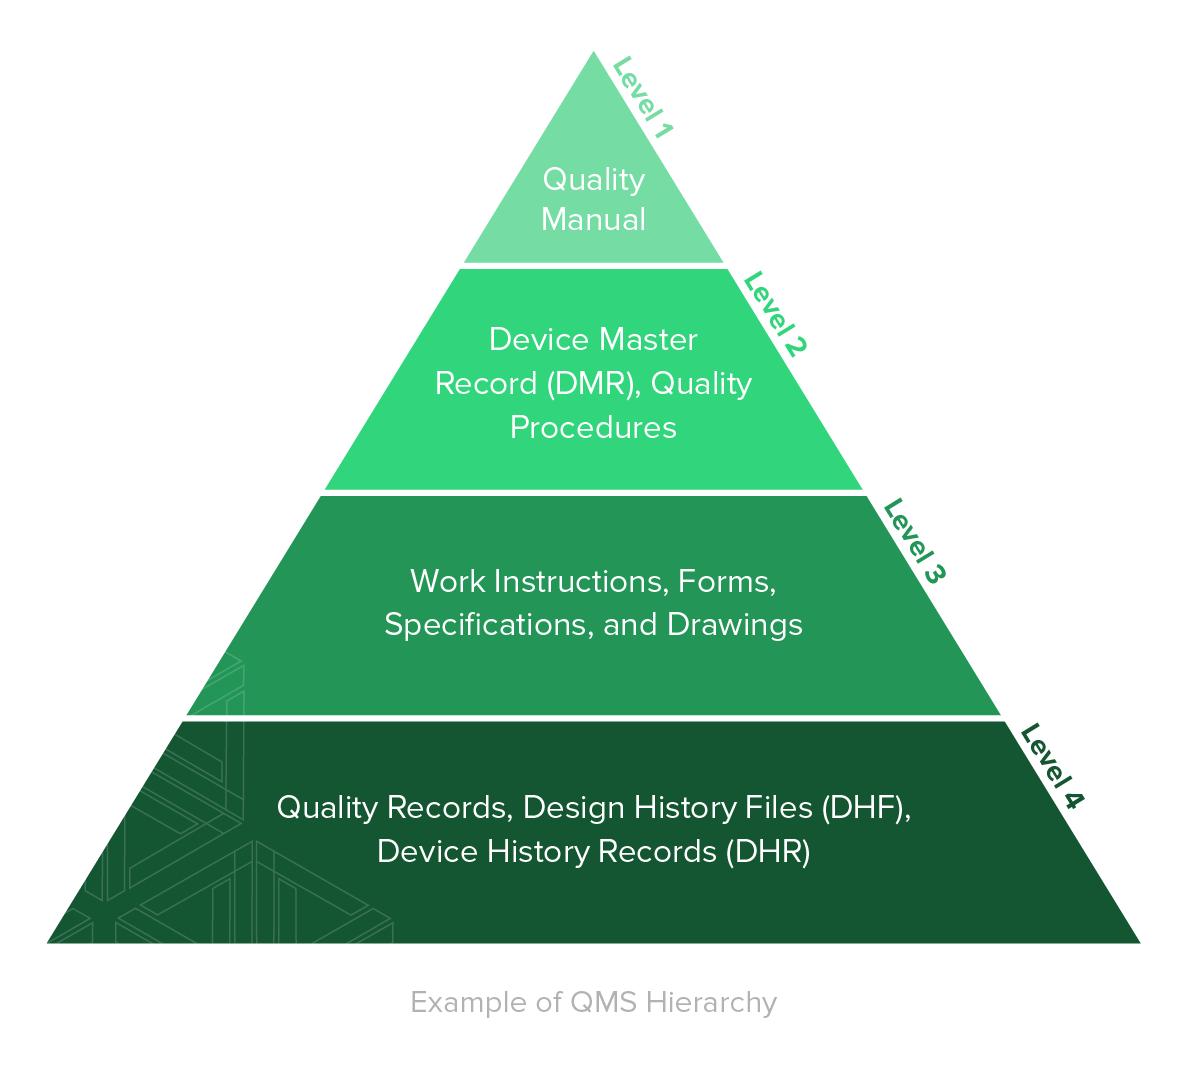 QMS Hierarchy